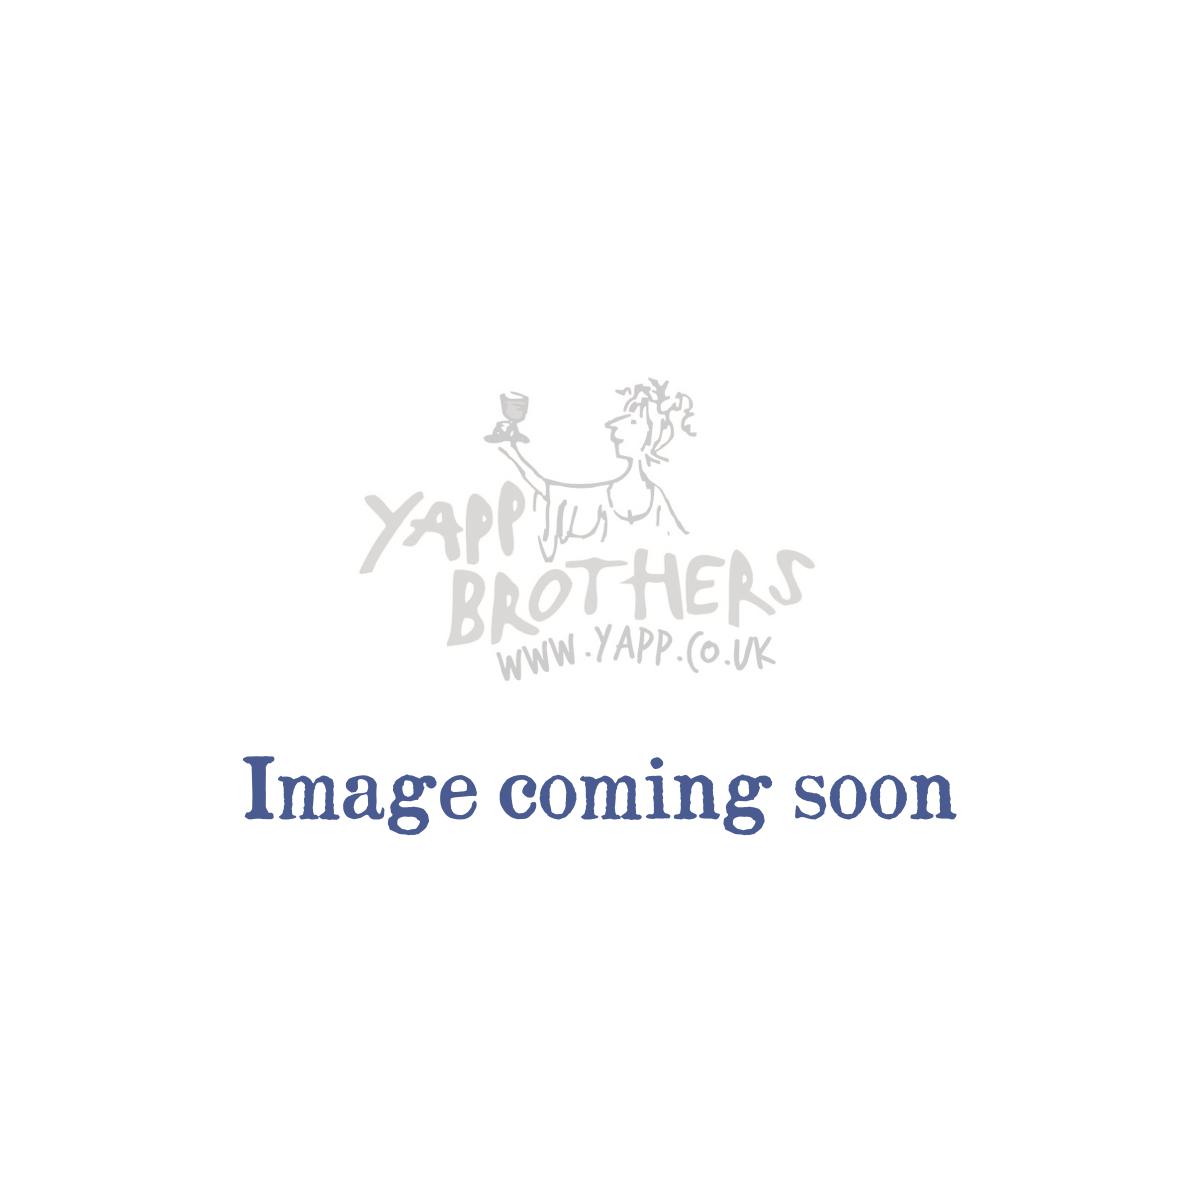 Jasper Hill: Emily's Paddock Shiraz - Cabernet Franc 2017 - Bottle Rear Label